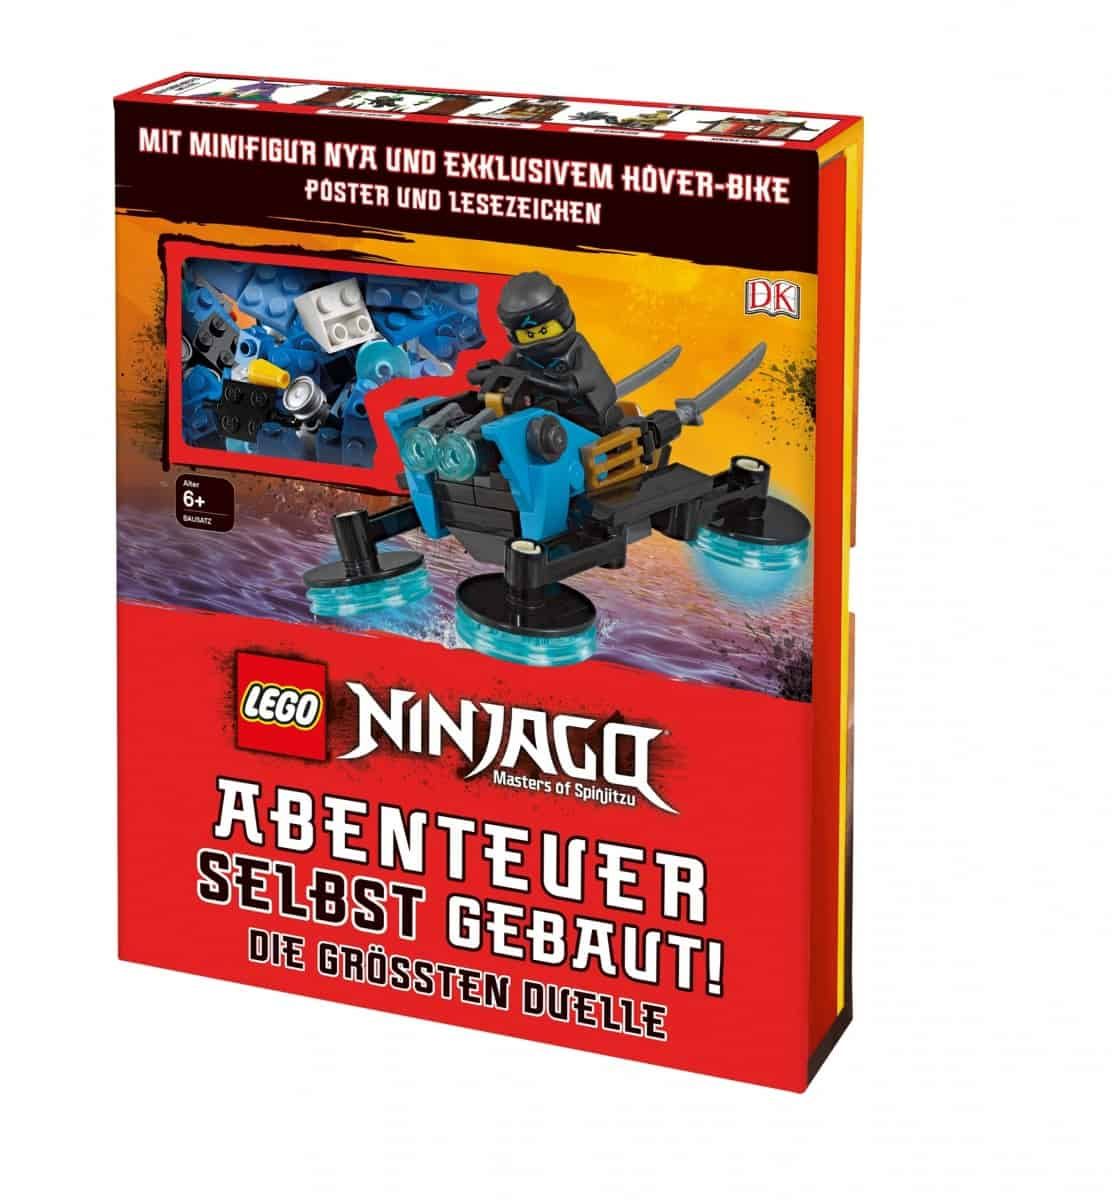 lego 5005671 ninjago abenteuer selbst gebaut scaled